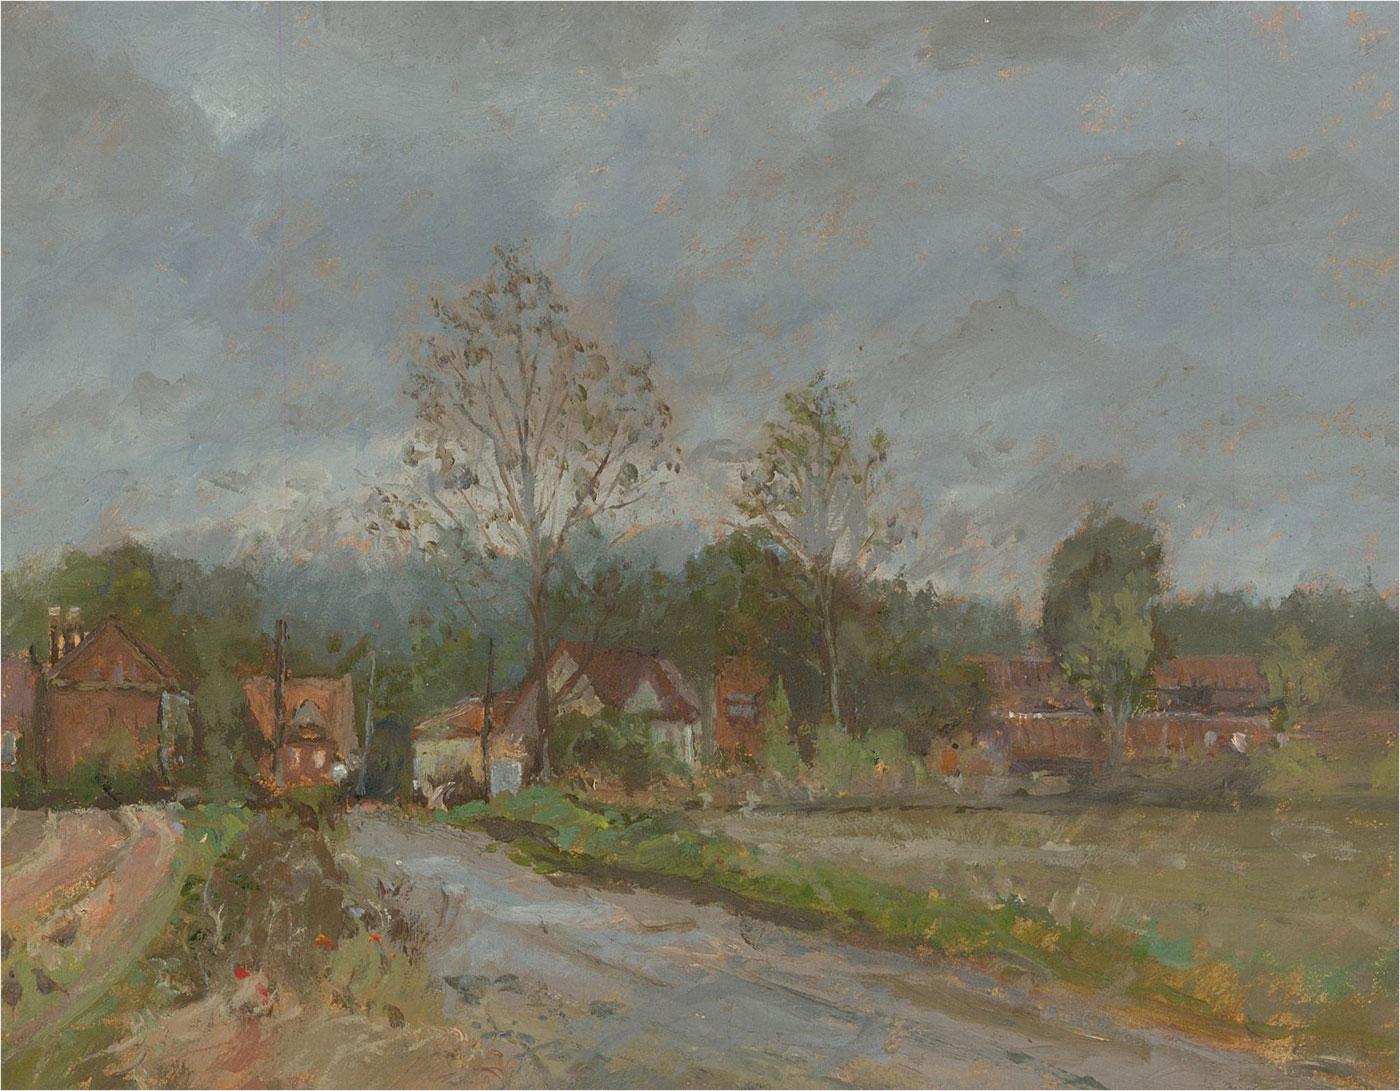 Keith Johnson (1931-2018) - Contemporary Oil, The Rainy Day, Runham Village